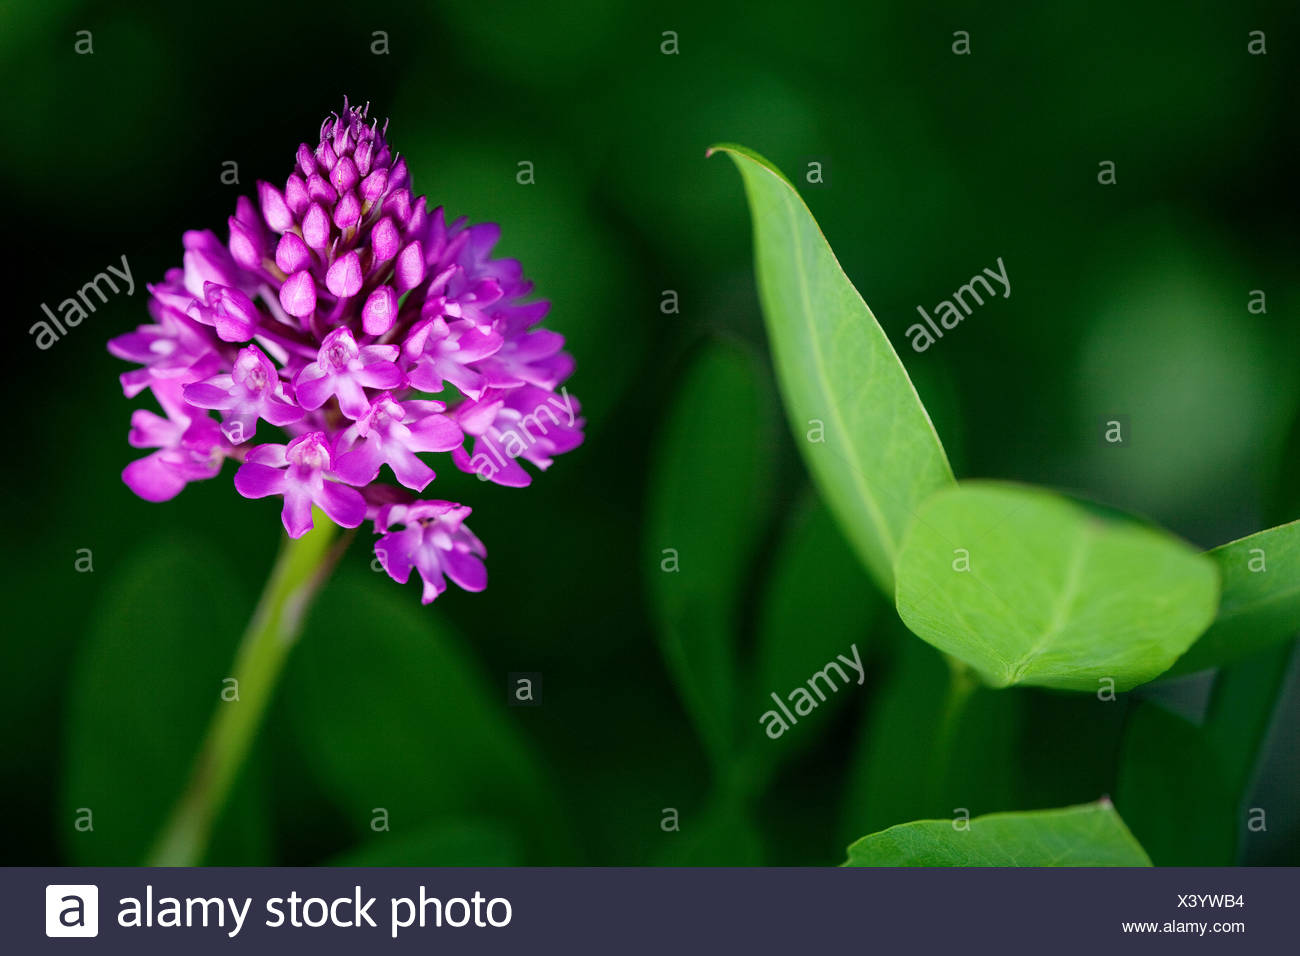 Pyramidal orchid (Anacamptis pyramidalis), Plitvice Lakes National Park, Croatia, Europe Stock Photo